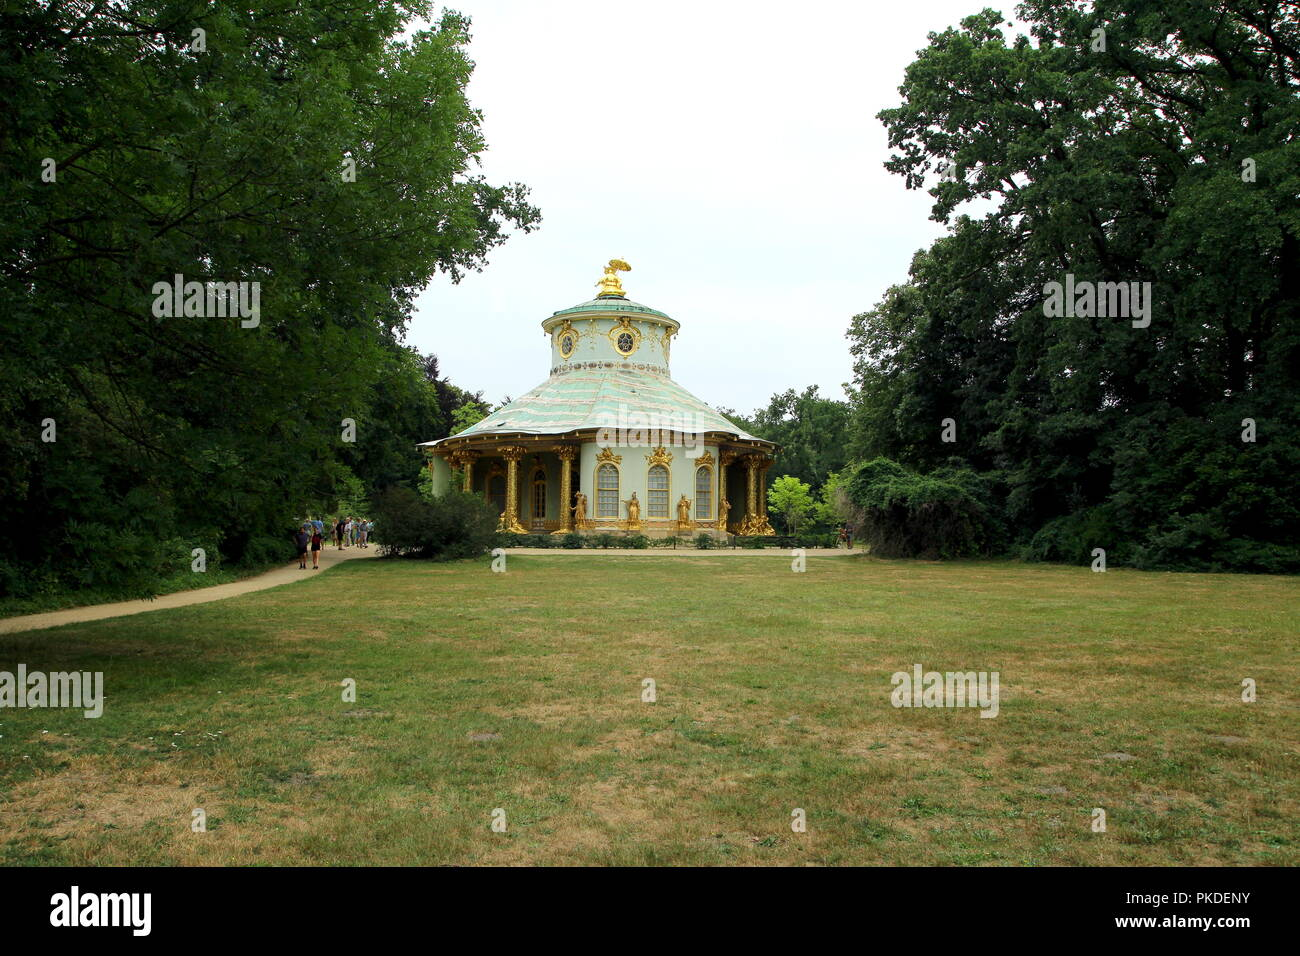 Chinese Tea House in Sanssouci Park, Potsdam, Germany. - Stock Image